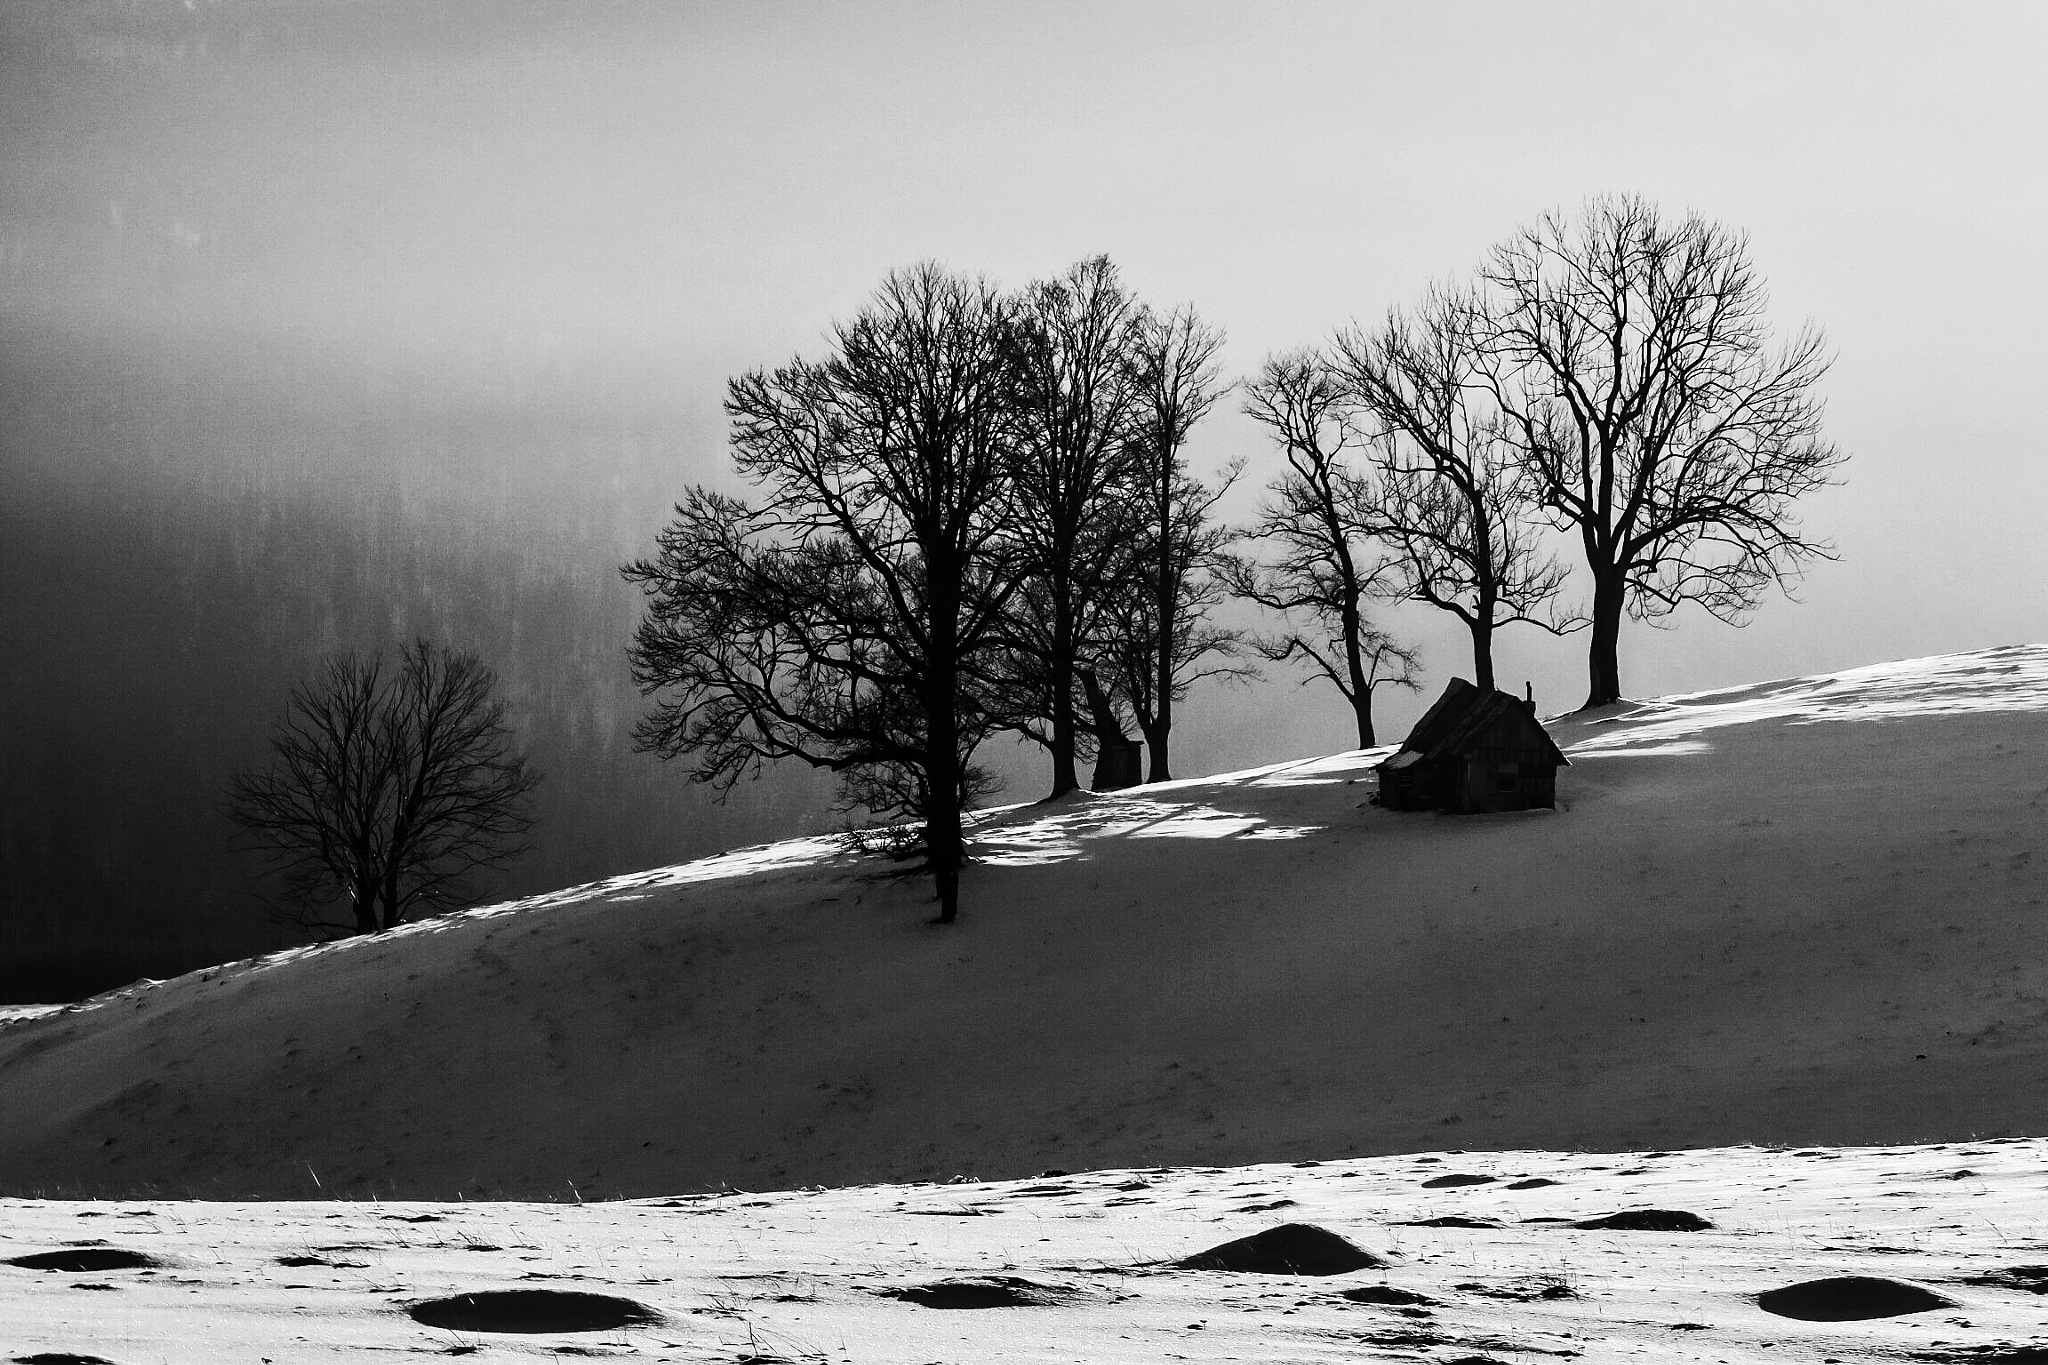 Winter in B&W by Adi Gli